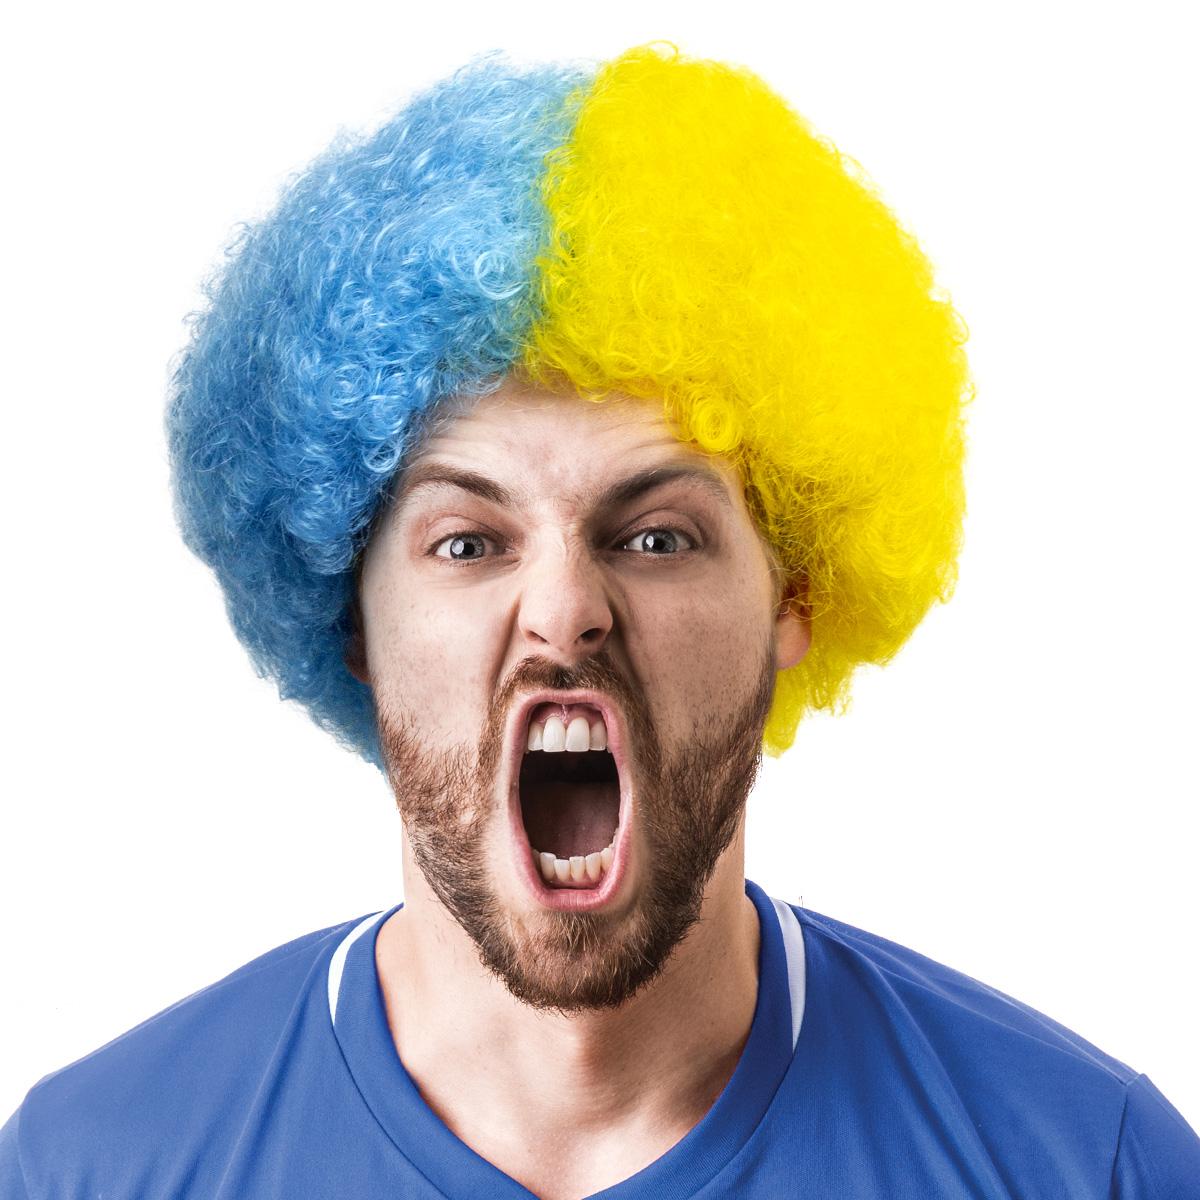 Peruk, supporter blå/gul